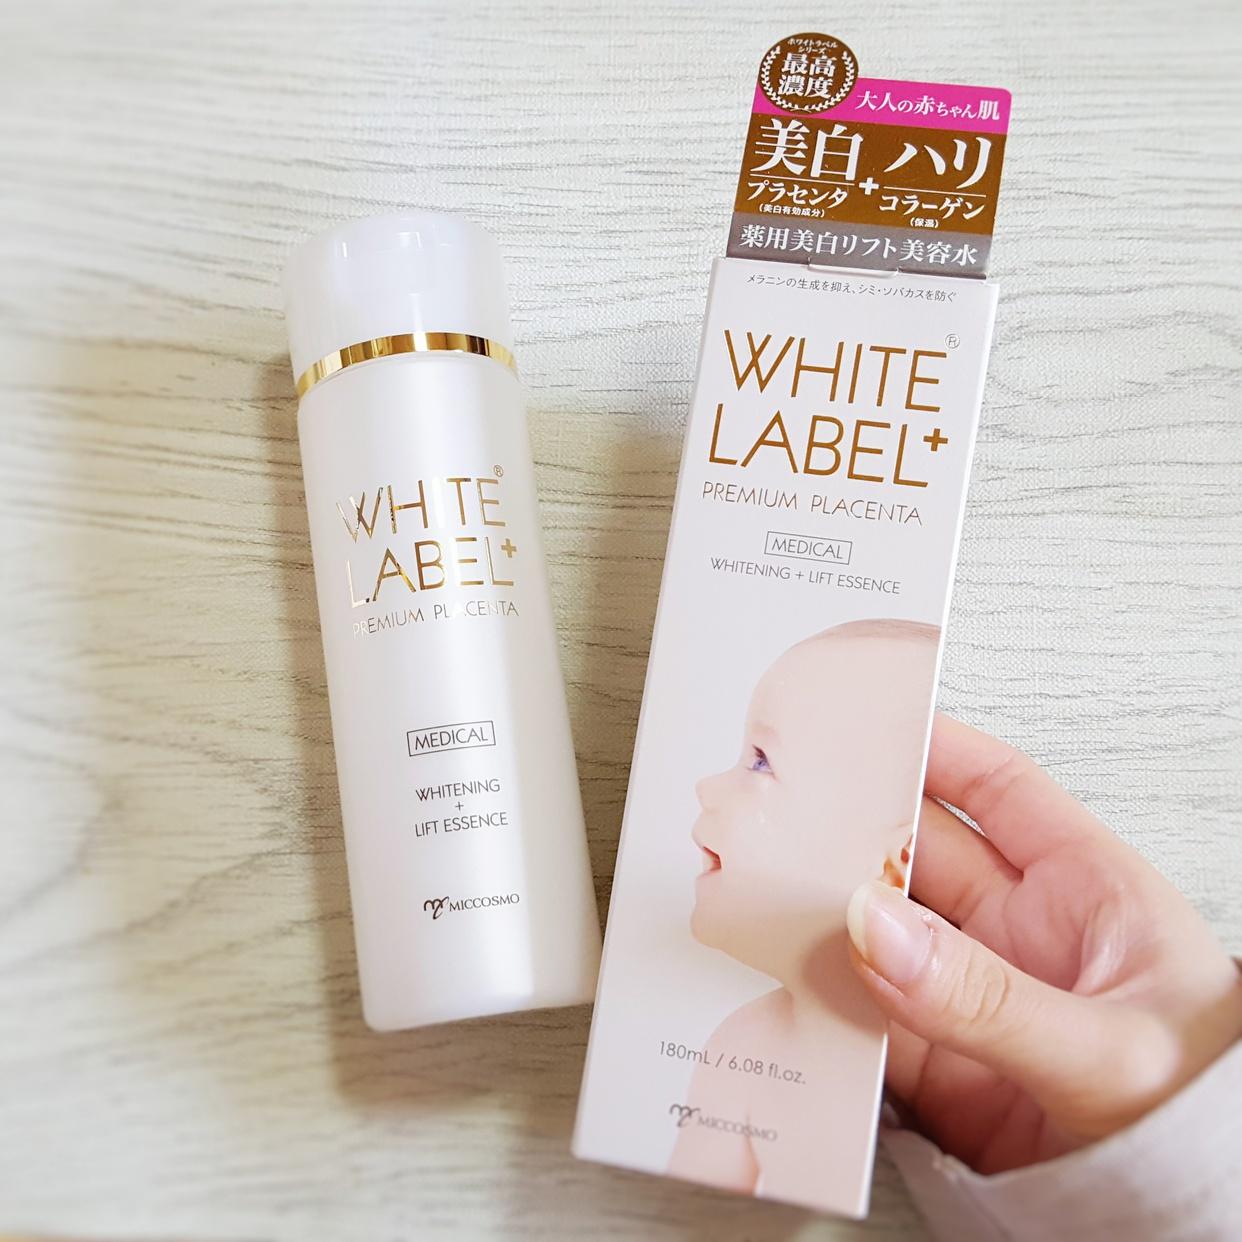 WHITE LABEL+(ホワイトラベルプラス) 薬用プラセンタの美白リフト美容水を使った銀麦さんのクチコミ画像